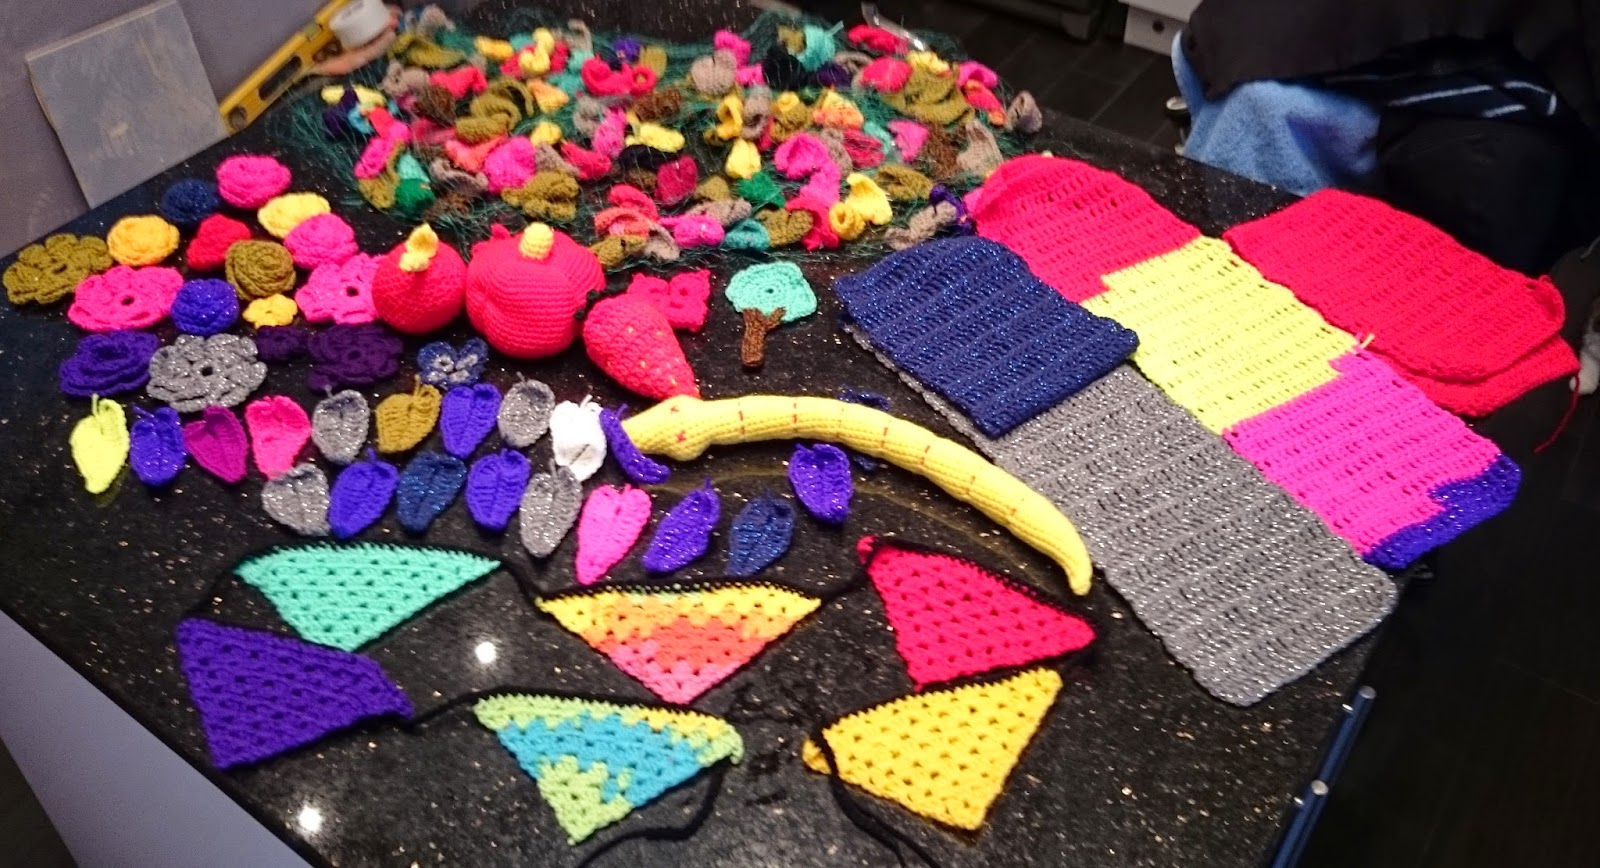 crochet yarn bomb yarnbomb mystical woodland world record breaker little havens hospice charity garden